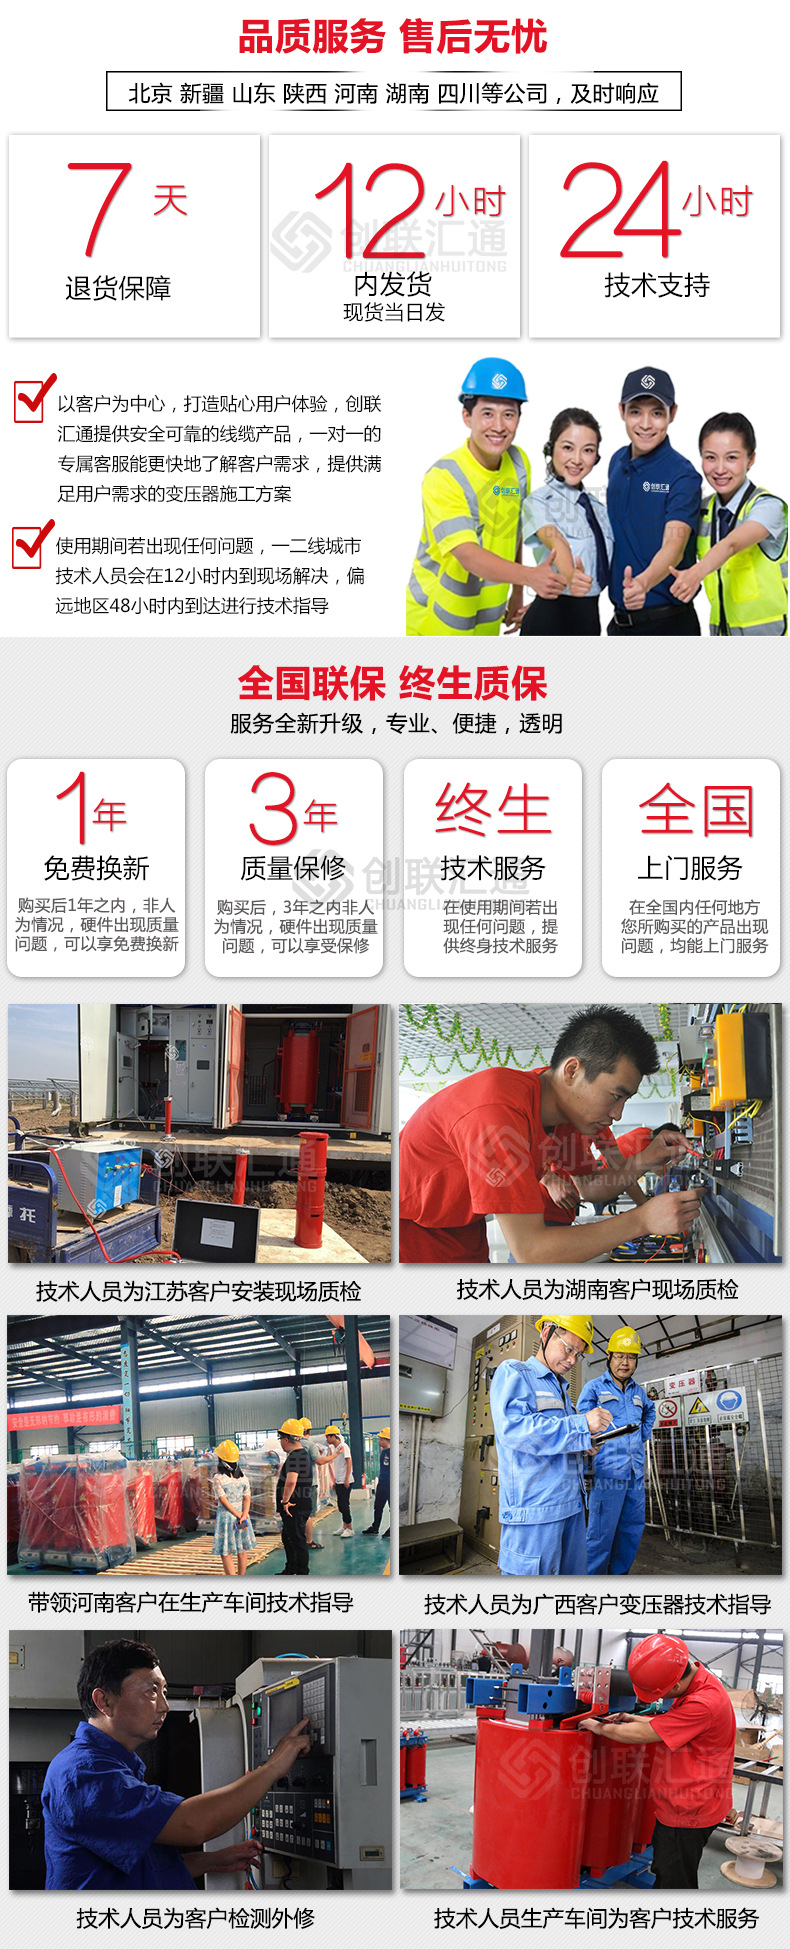 SCB10-250kva/10kv干式变压器 scb10型环氧树脂浇筑 厂家现货直销-创联汇通示例图19